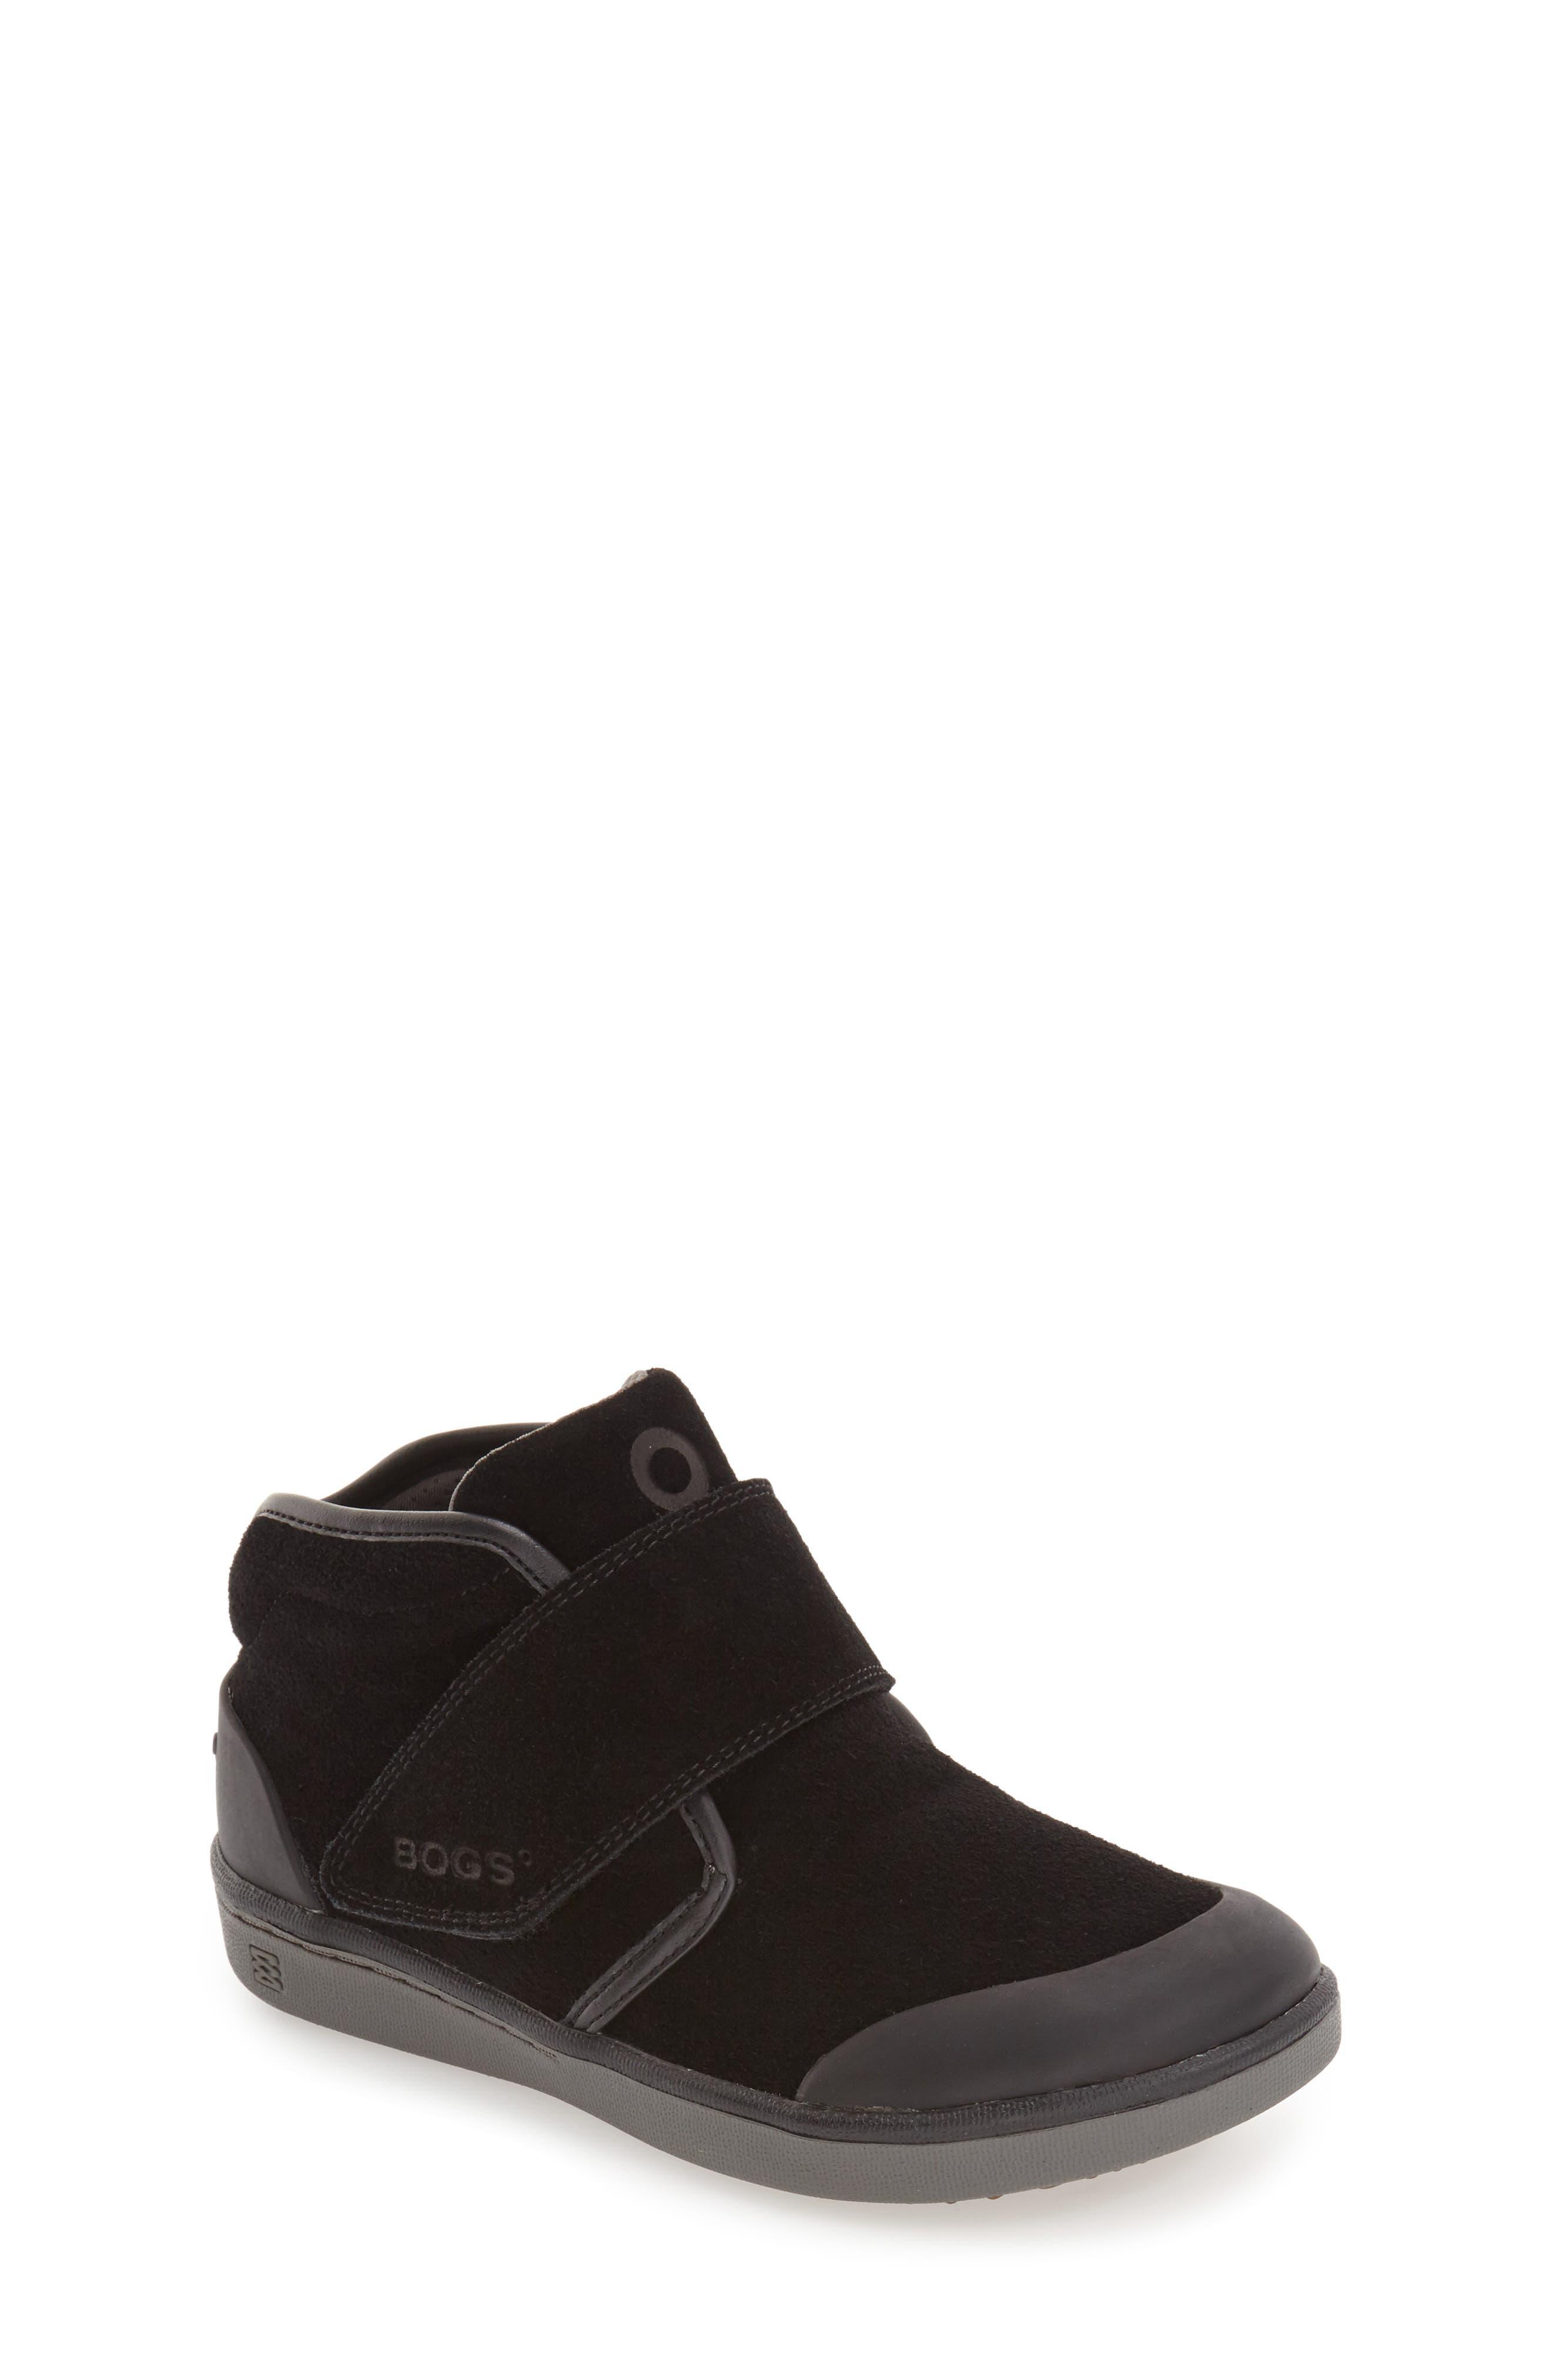 'Sammy' Waterproof Sneaker,                             Main thumbnail 1, color,                             BLACK/ BLACK